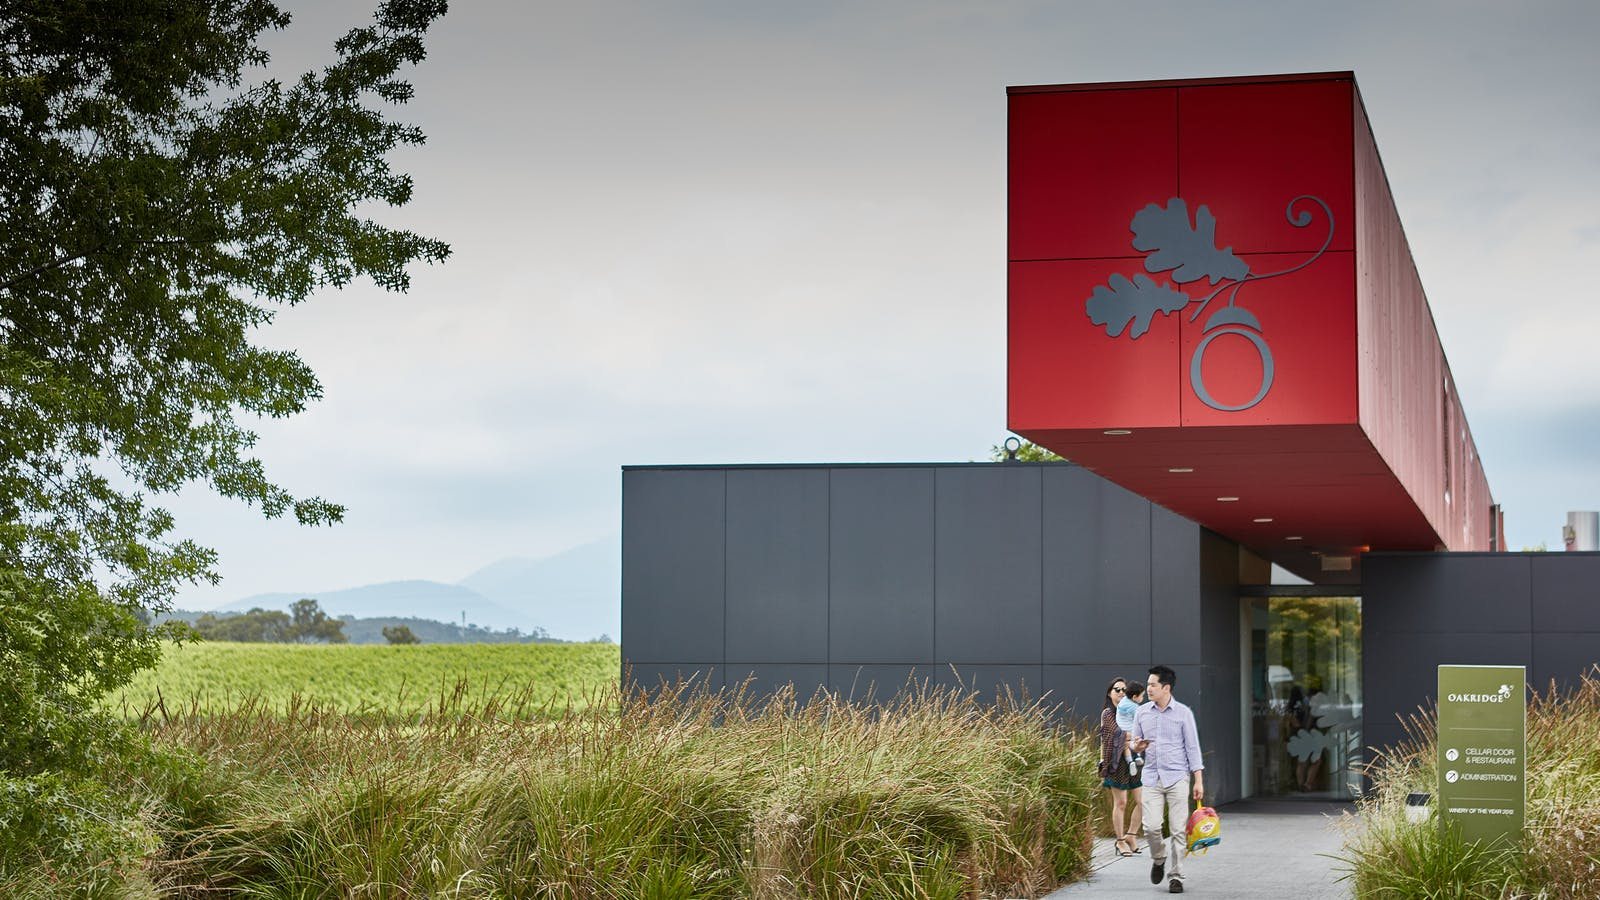 Oakridge Wines, Food and Wine, Yarra Valley & Dandenong Ranges, Victoria, Australia